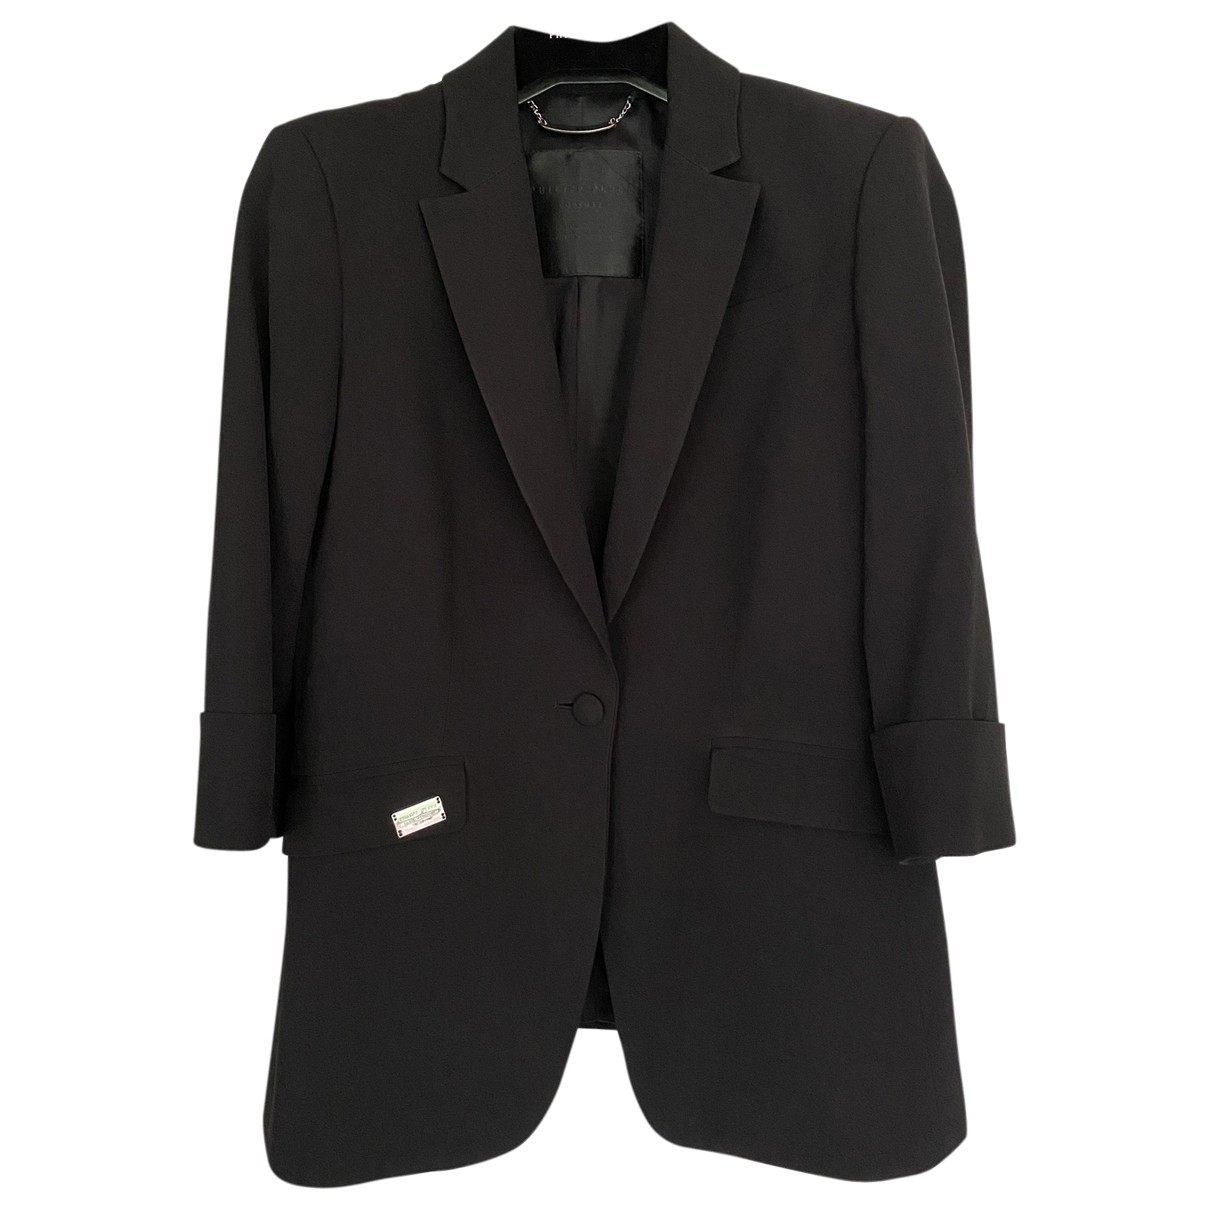 Philipp Plein \N Black jacket for Women M International